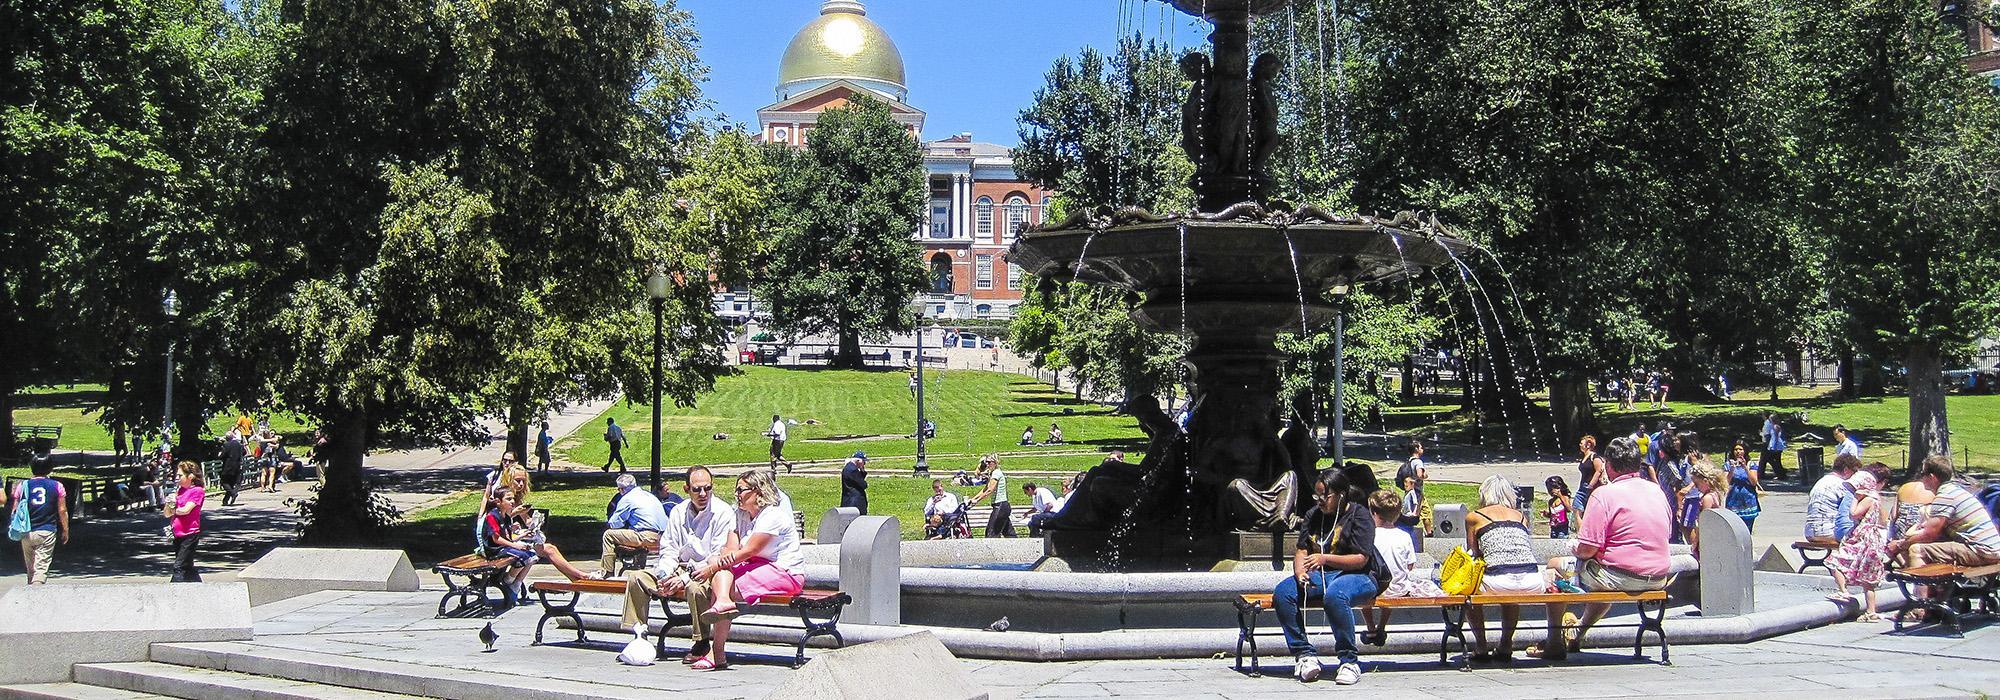 BostonCommon.jpg